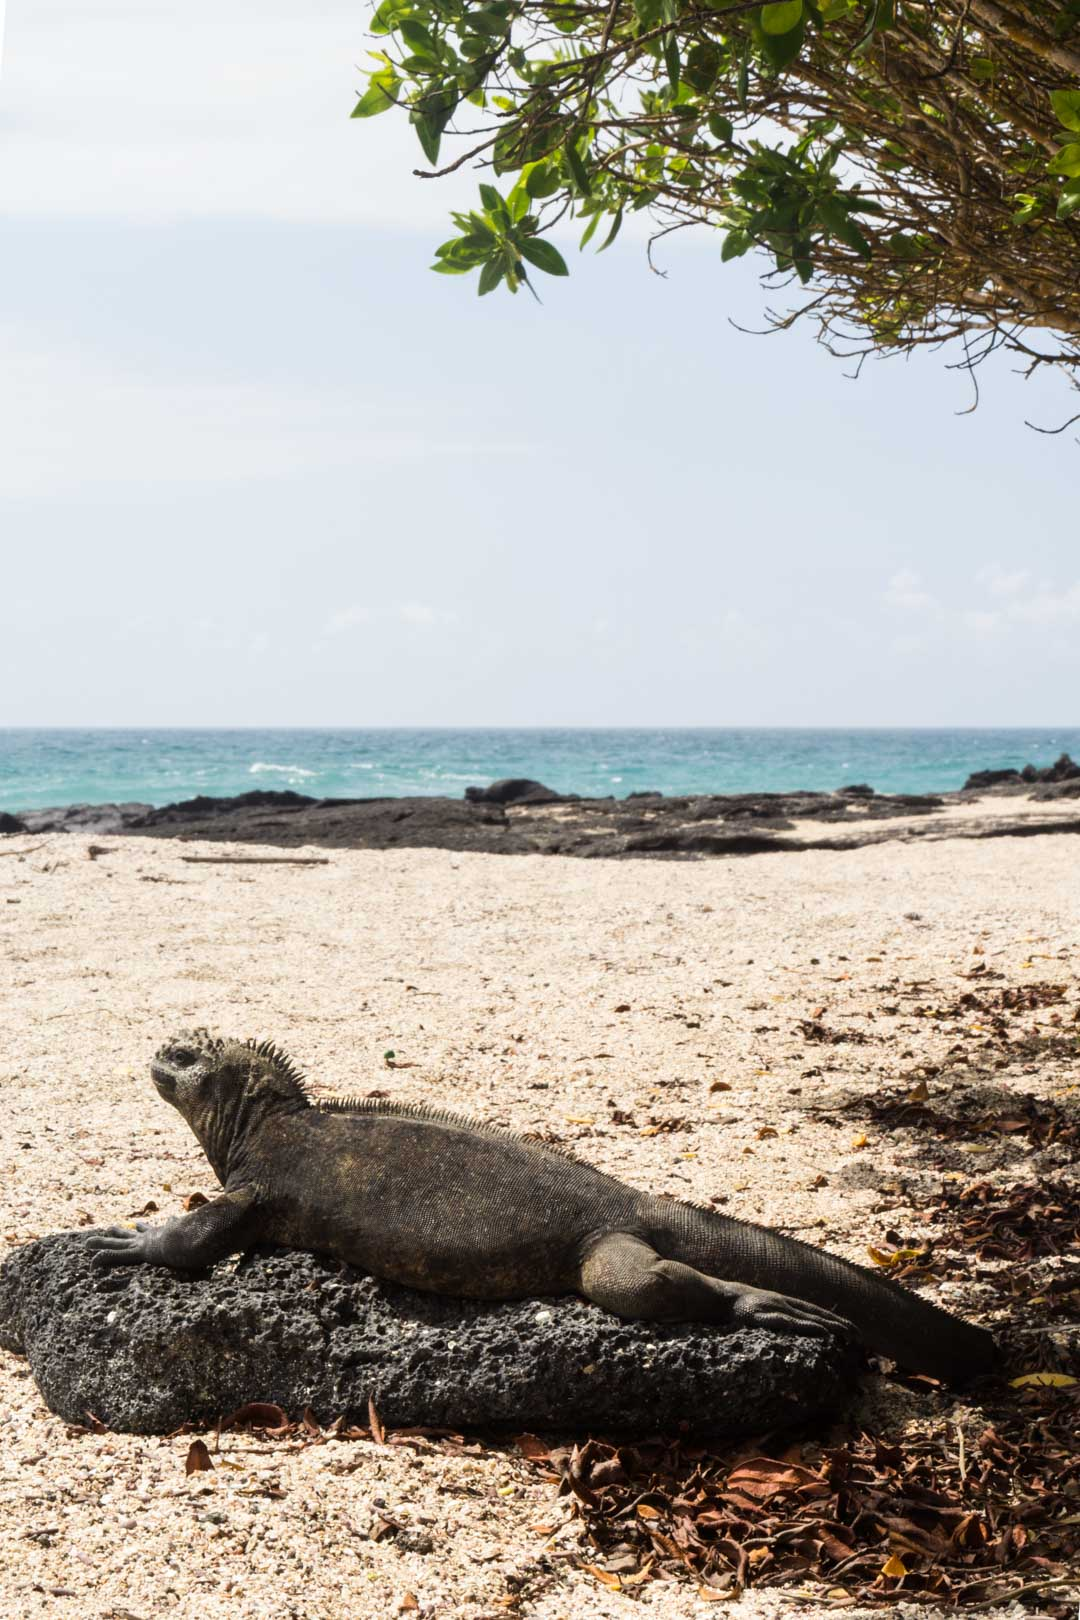 merileguaani Isabela-saarella Galapagossaarilla